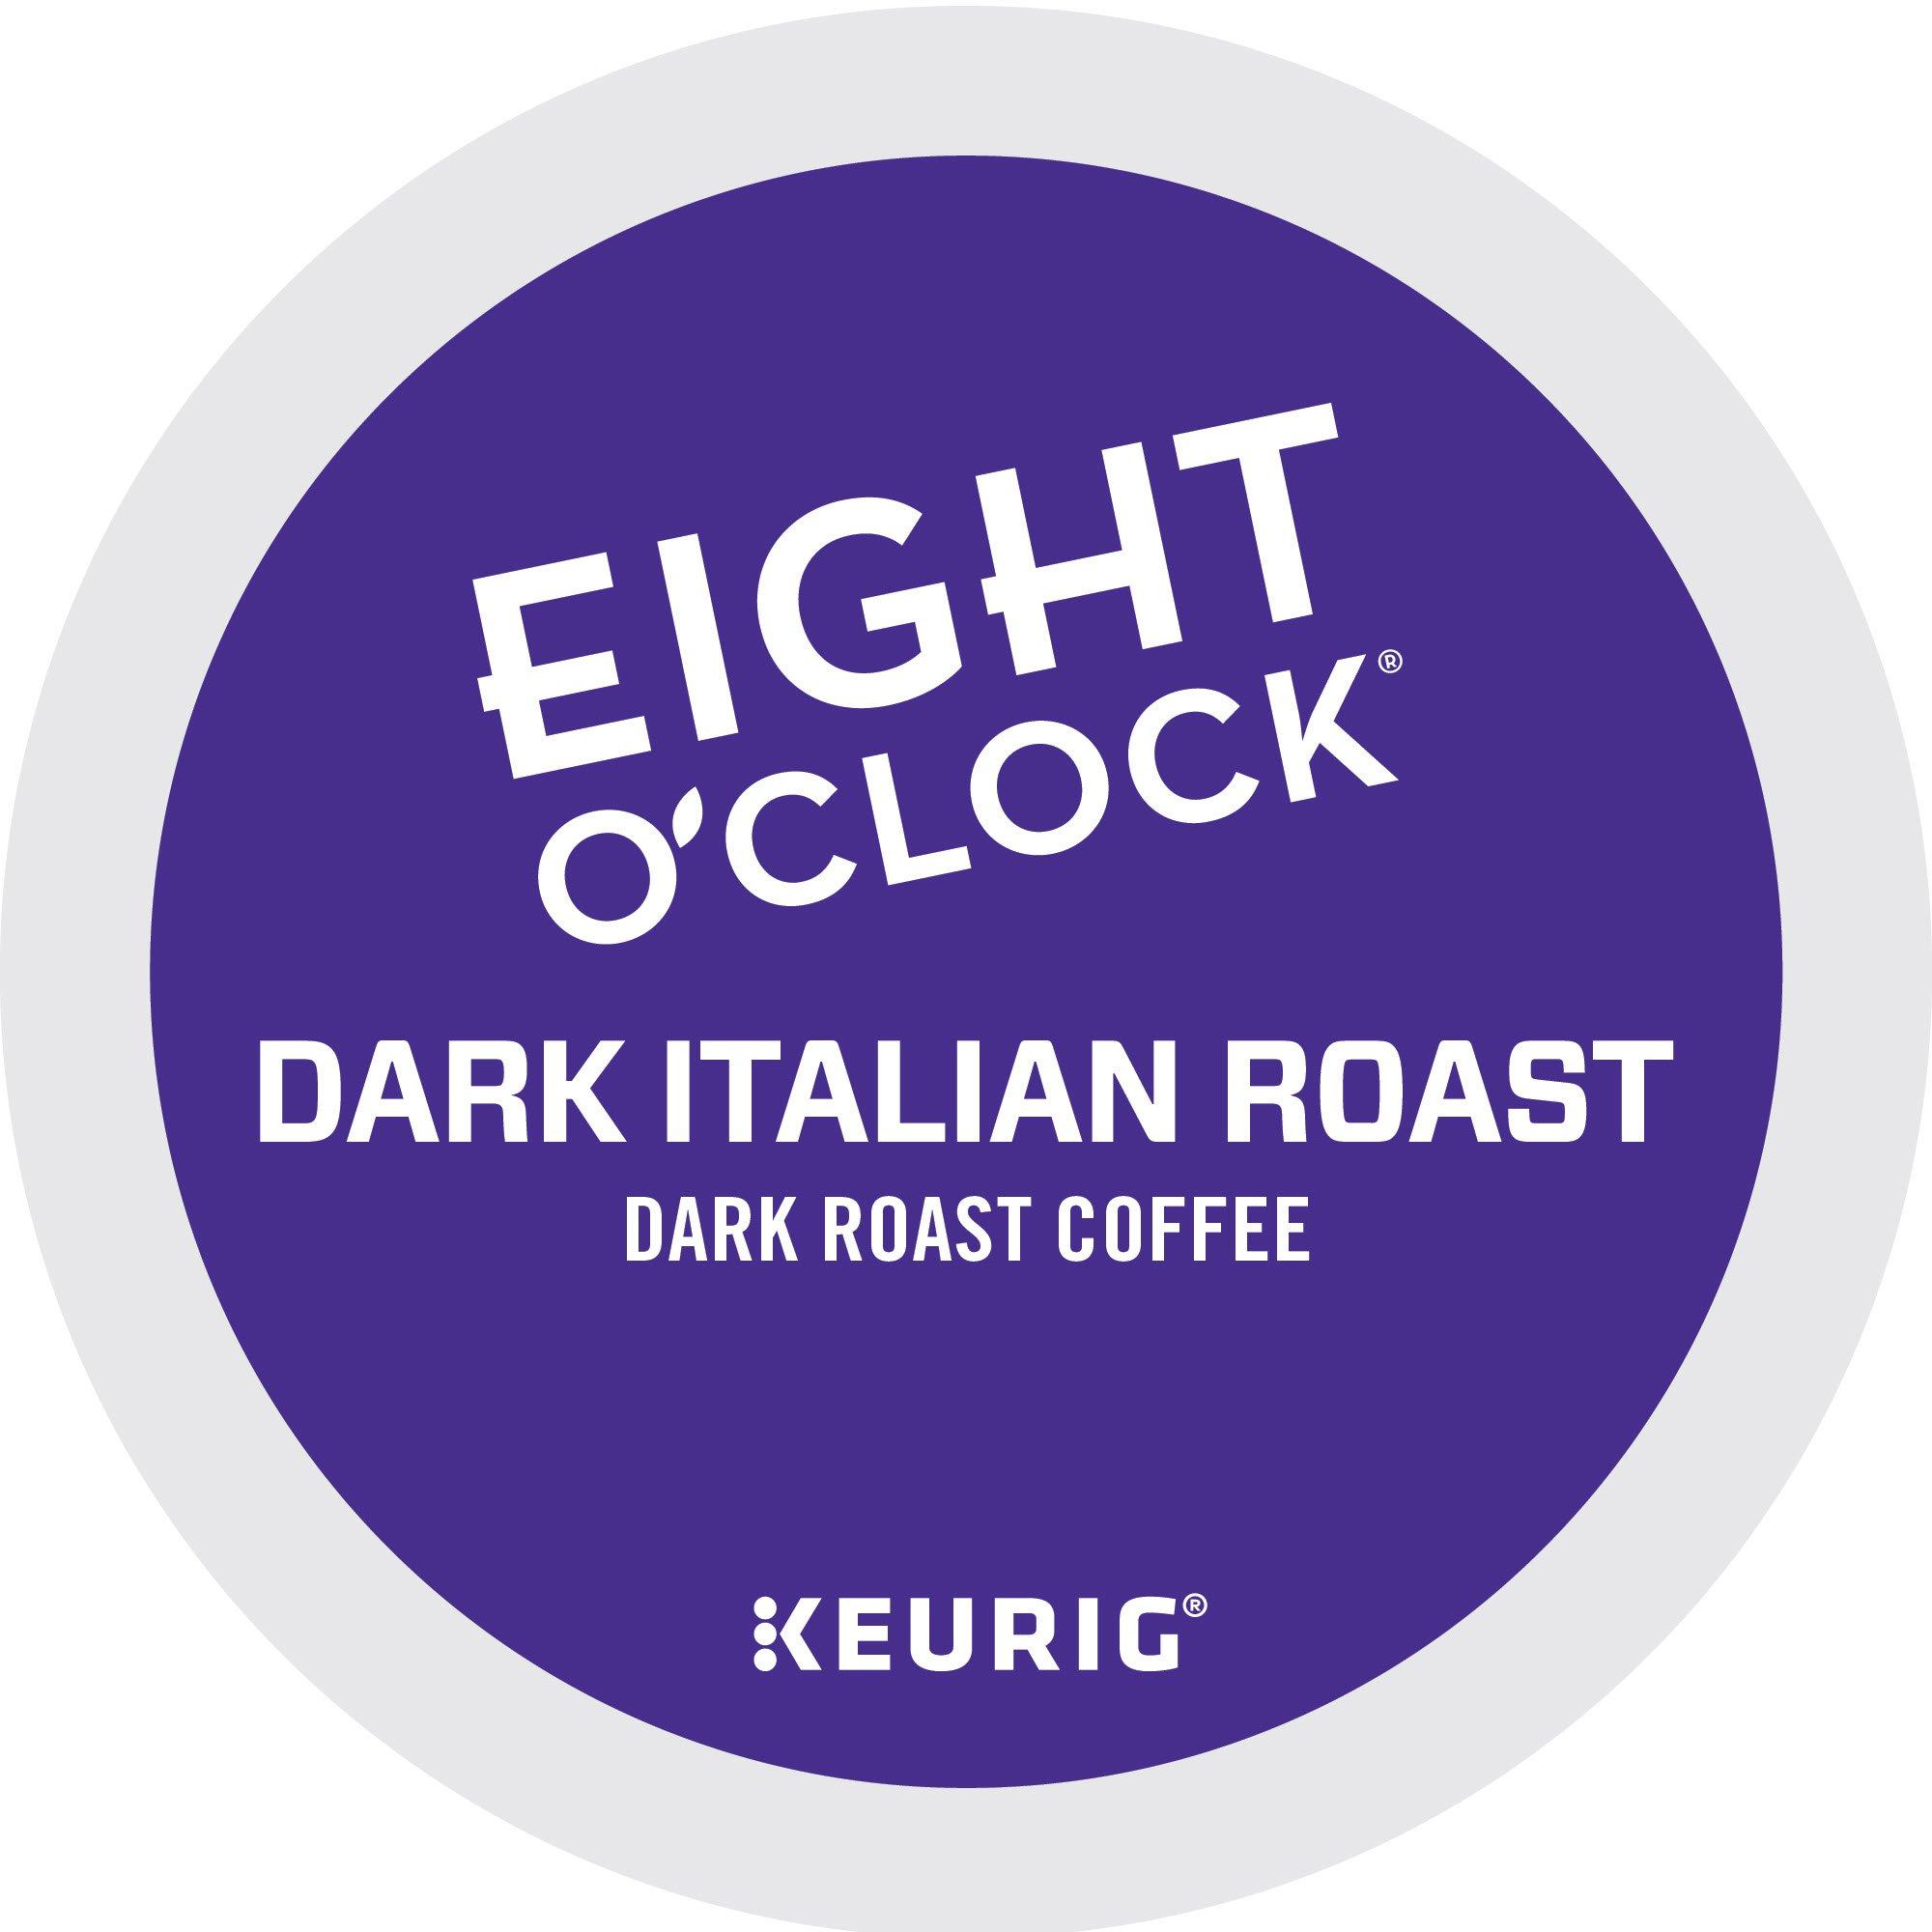 Eight O'Clock Coffee Dark Italian Roast Keurig Single-Serve K-Cup Pods, Dark Roast Coffee, 72 Count (6 Boxes of 12 Pods)